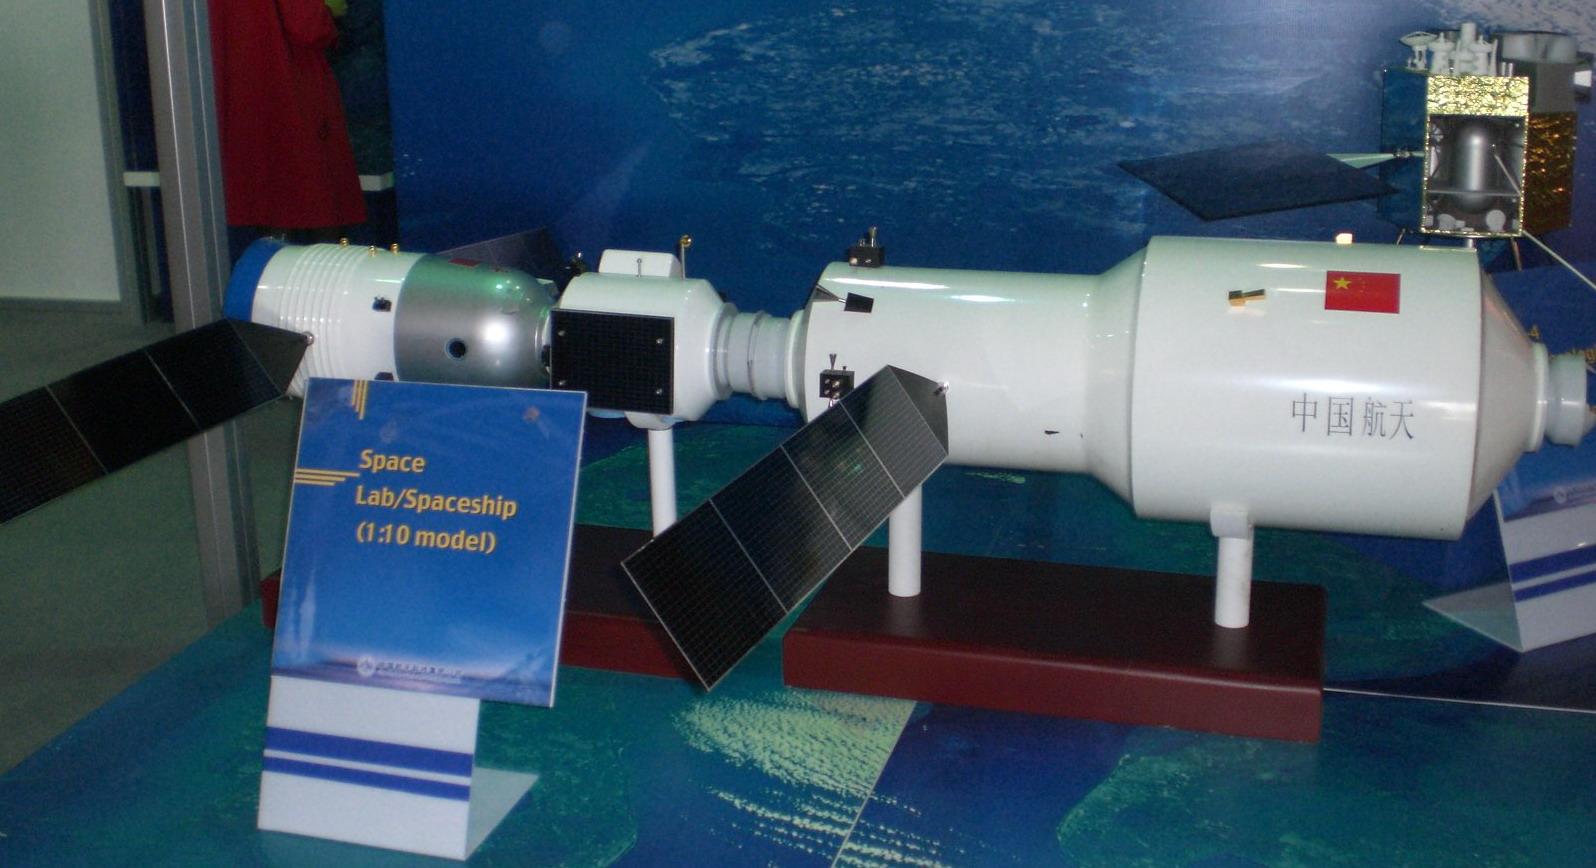 Tiangong-2 (天宫二号) pronta per il lancio